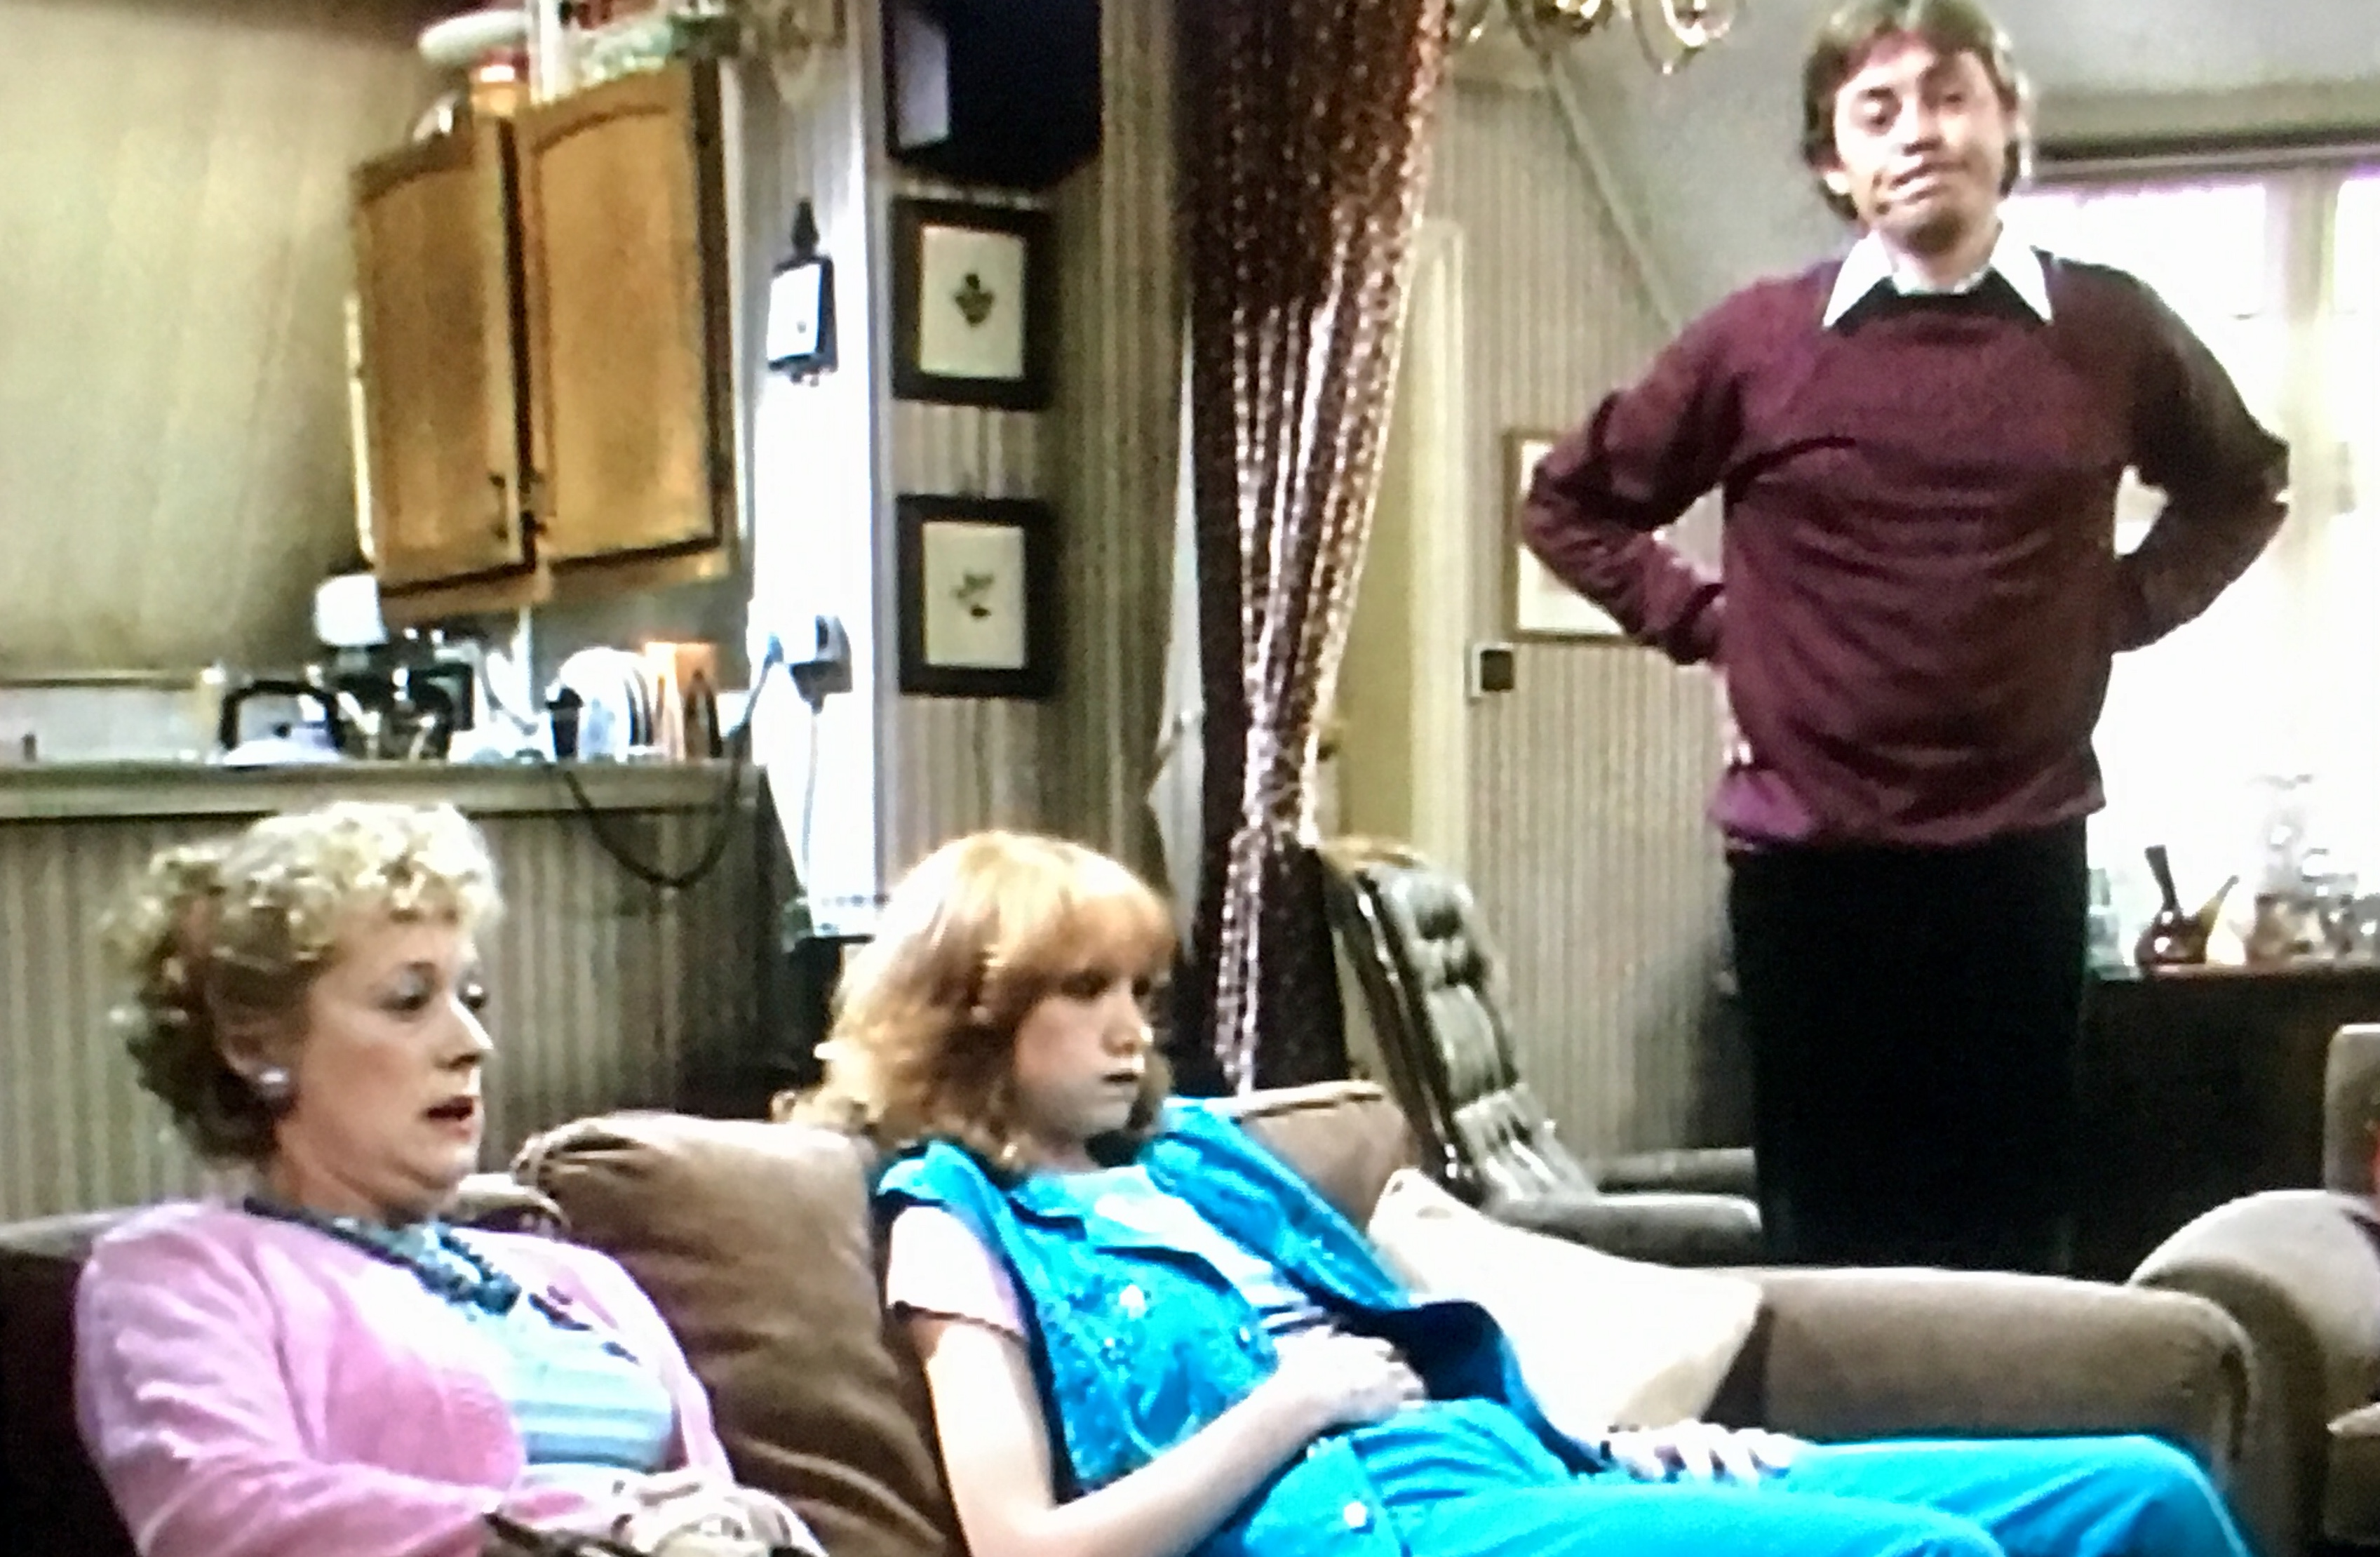 Hywel Bennett, Belinda Sinclair, and Josephine Tewson in Shelley (1979)